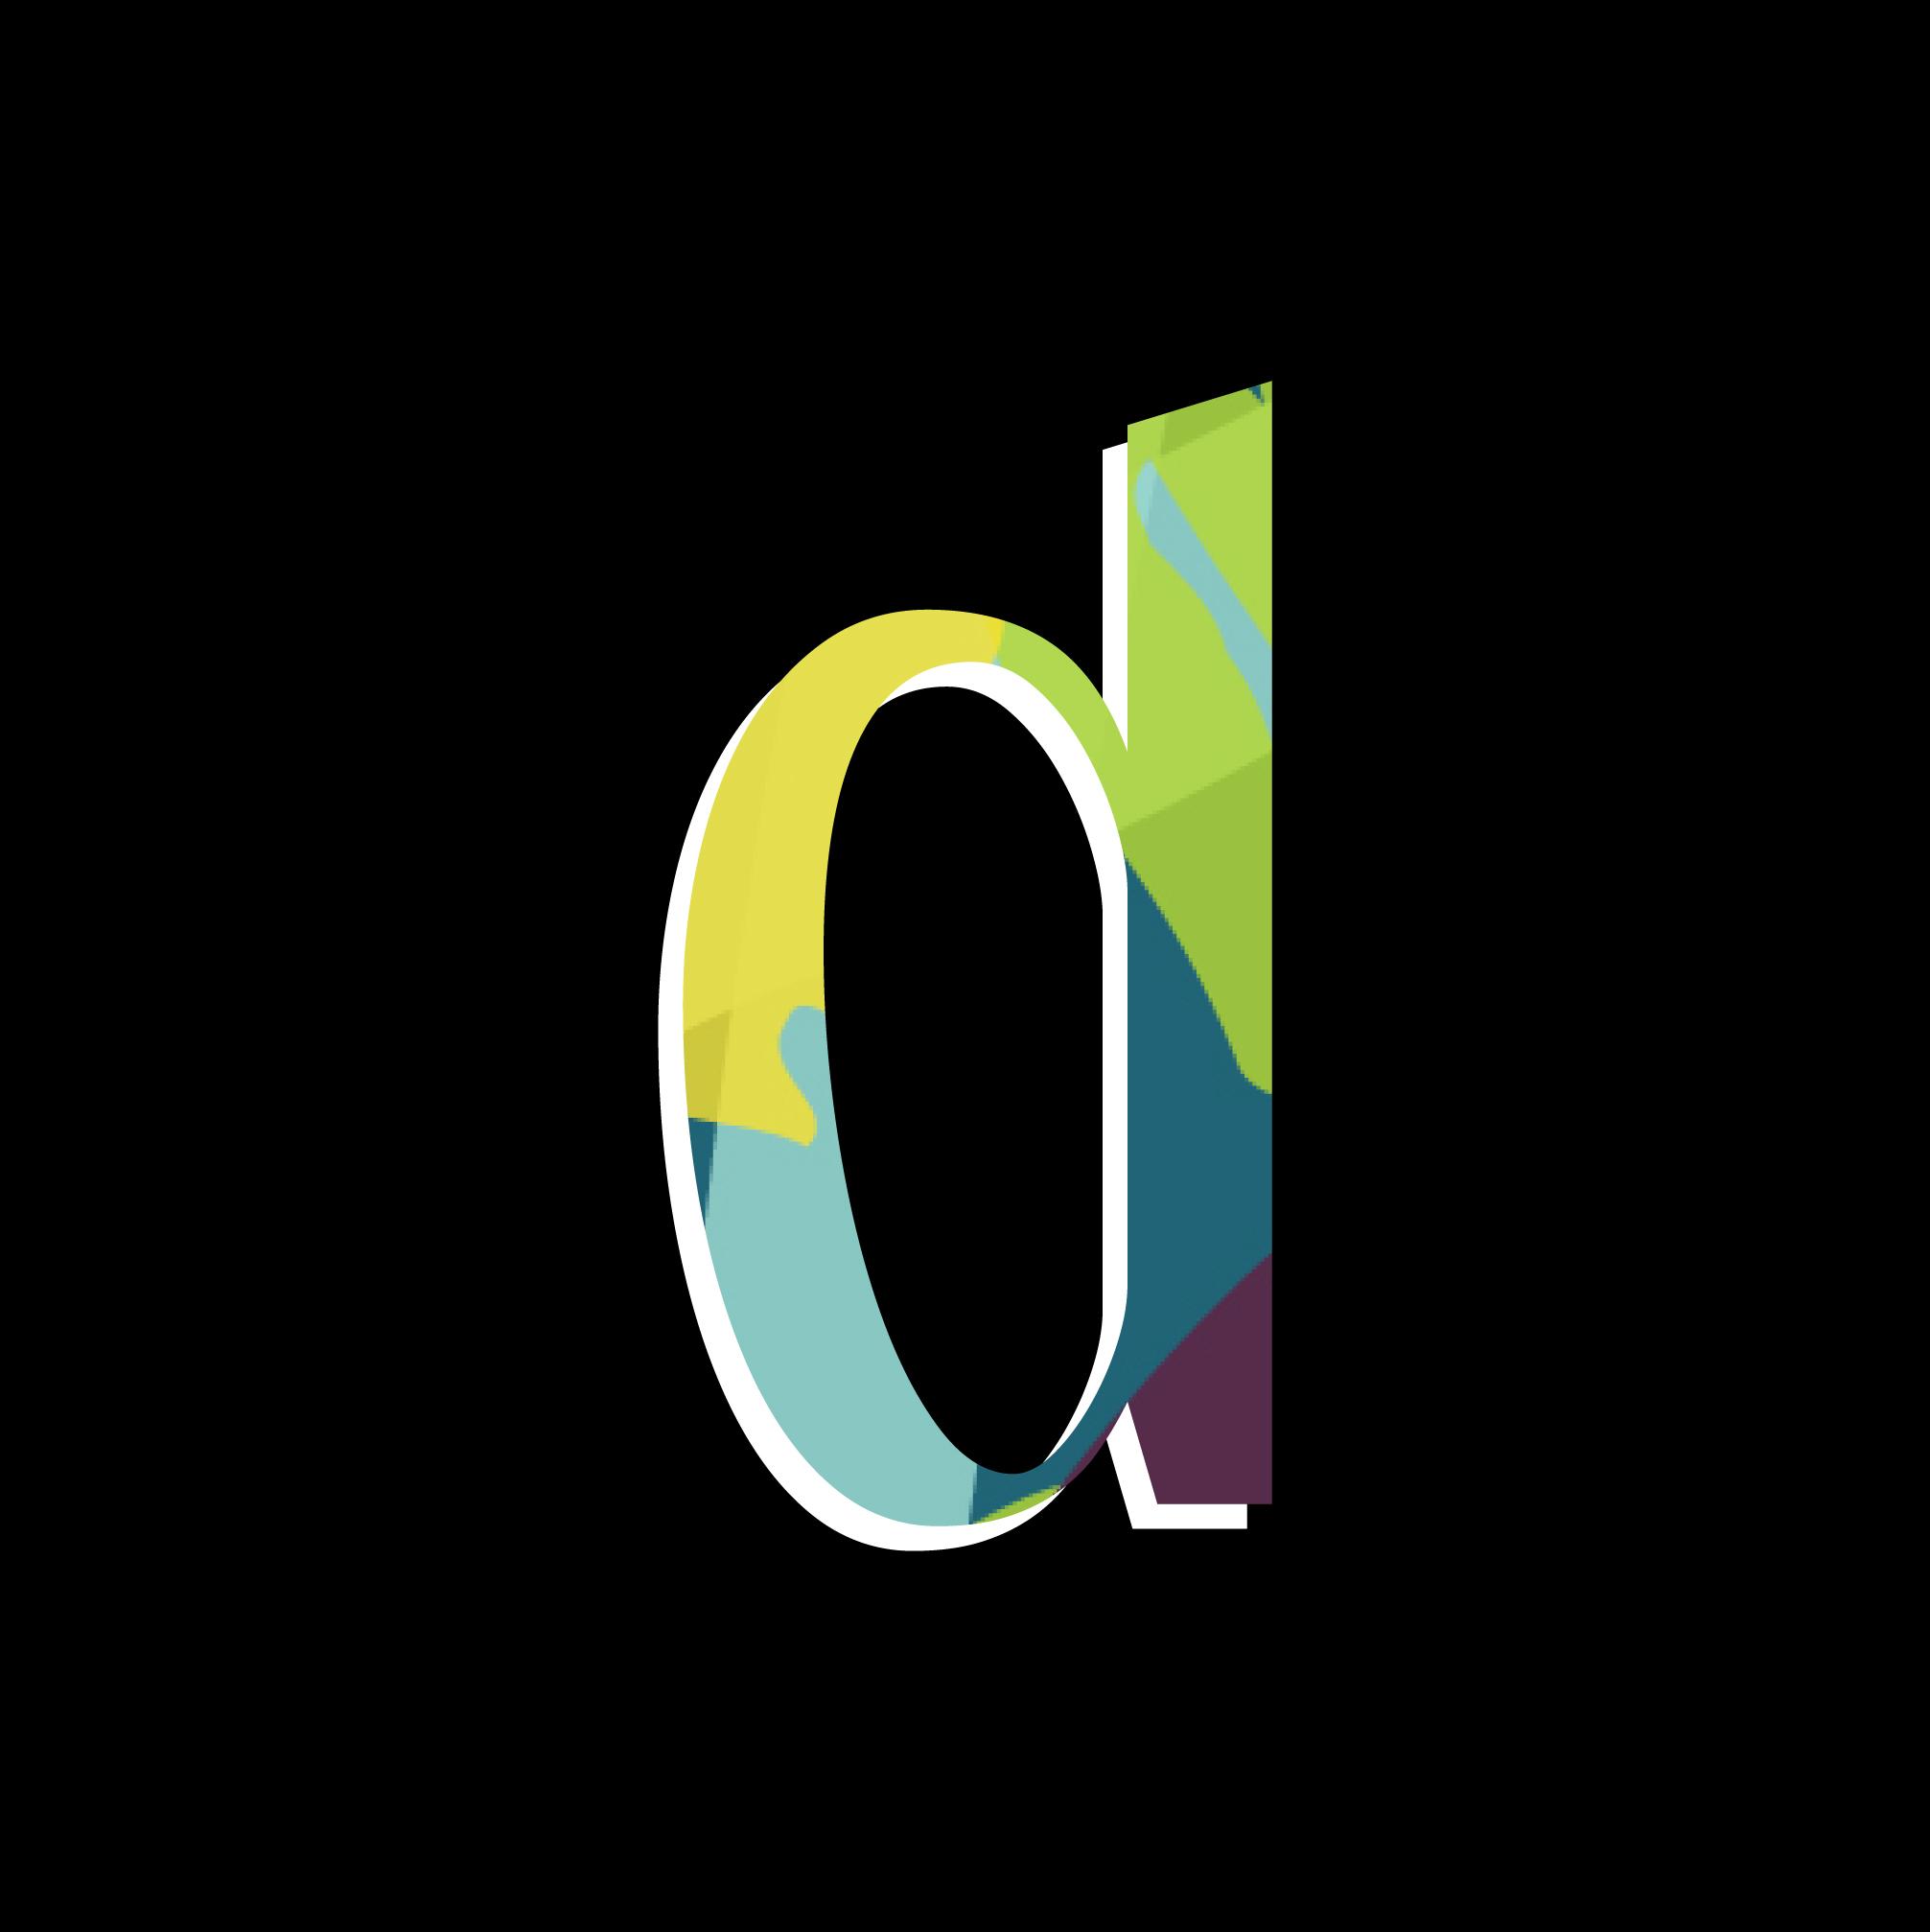 Dotson Course Design Submark #21 | Tiffany Kuehl Designs  #coursedesign #coursecreation #branding #logo #logodesign #brandstylist #branddesigner